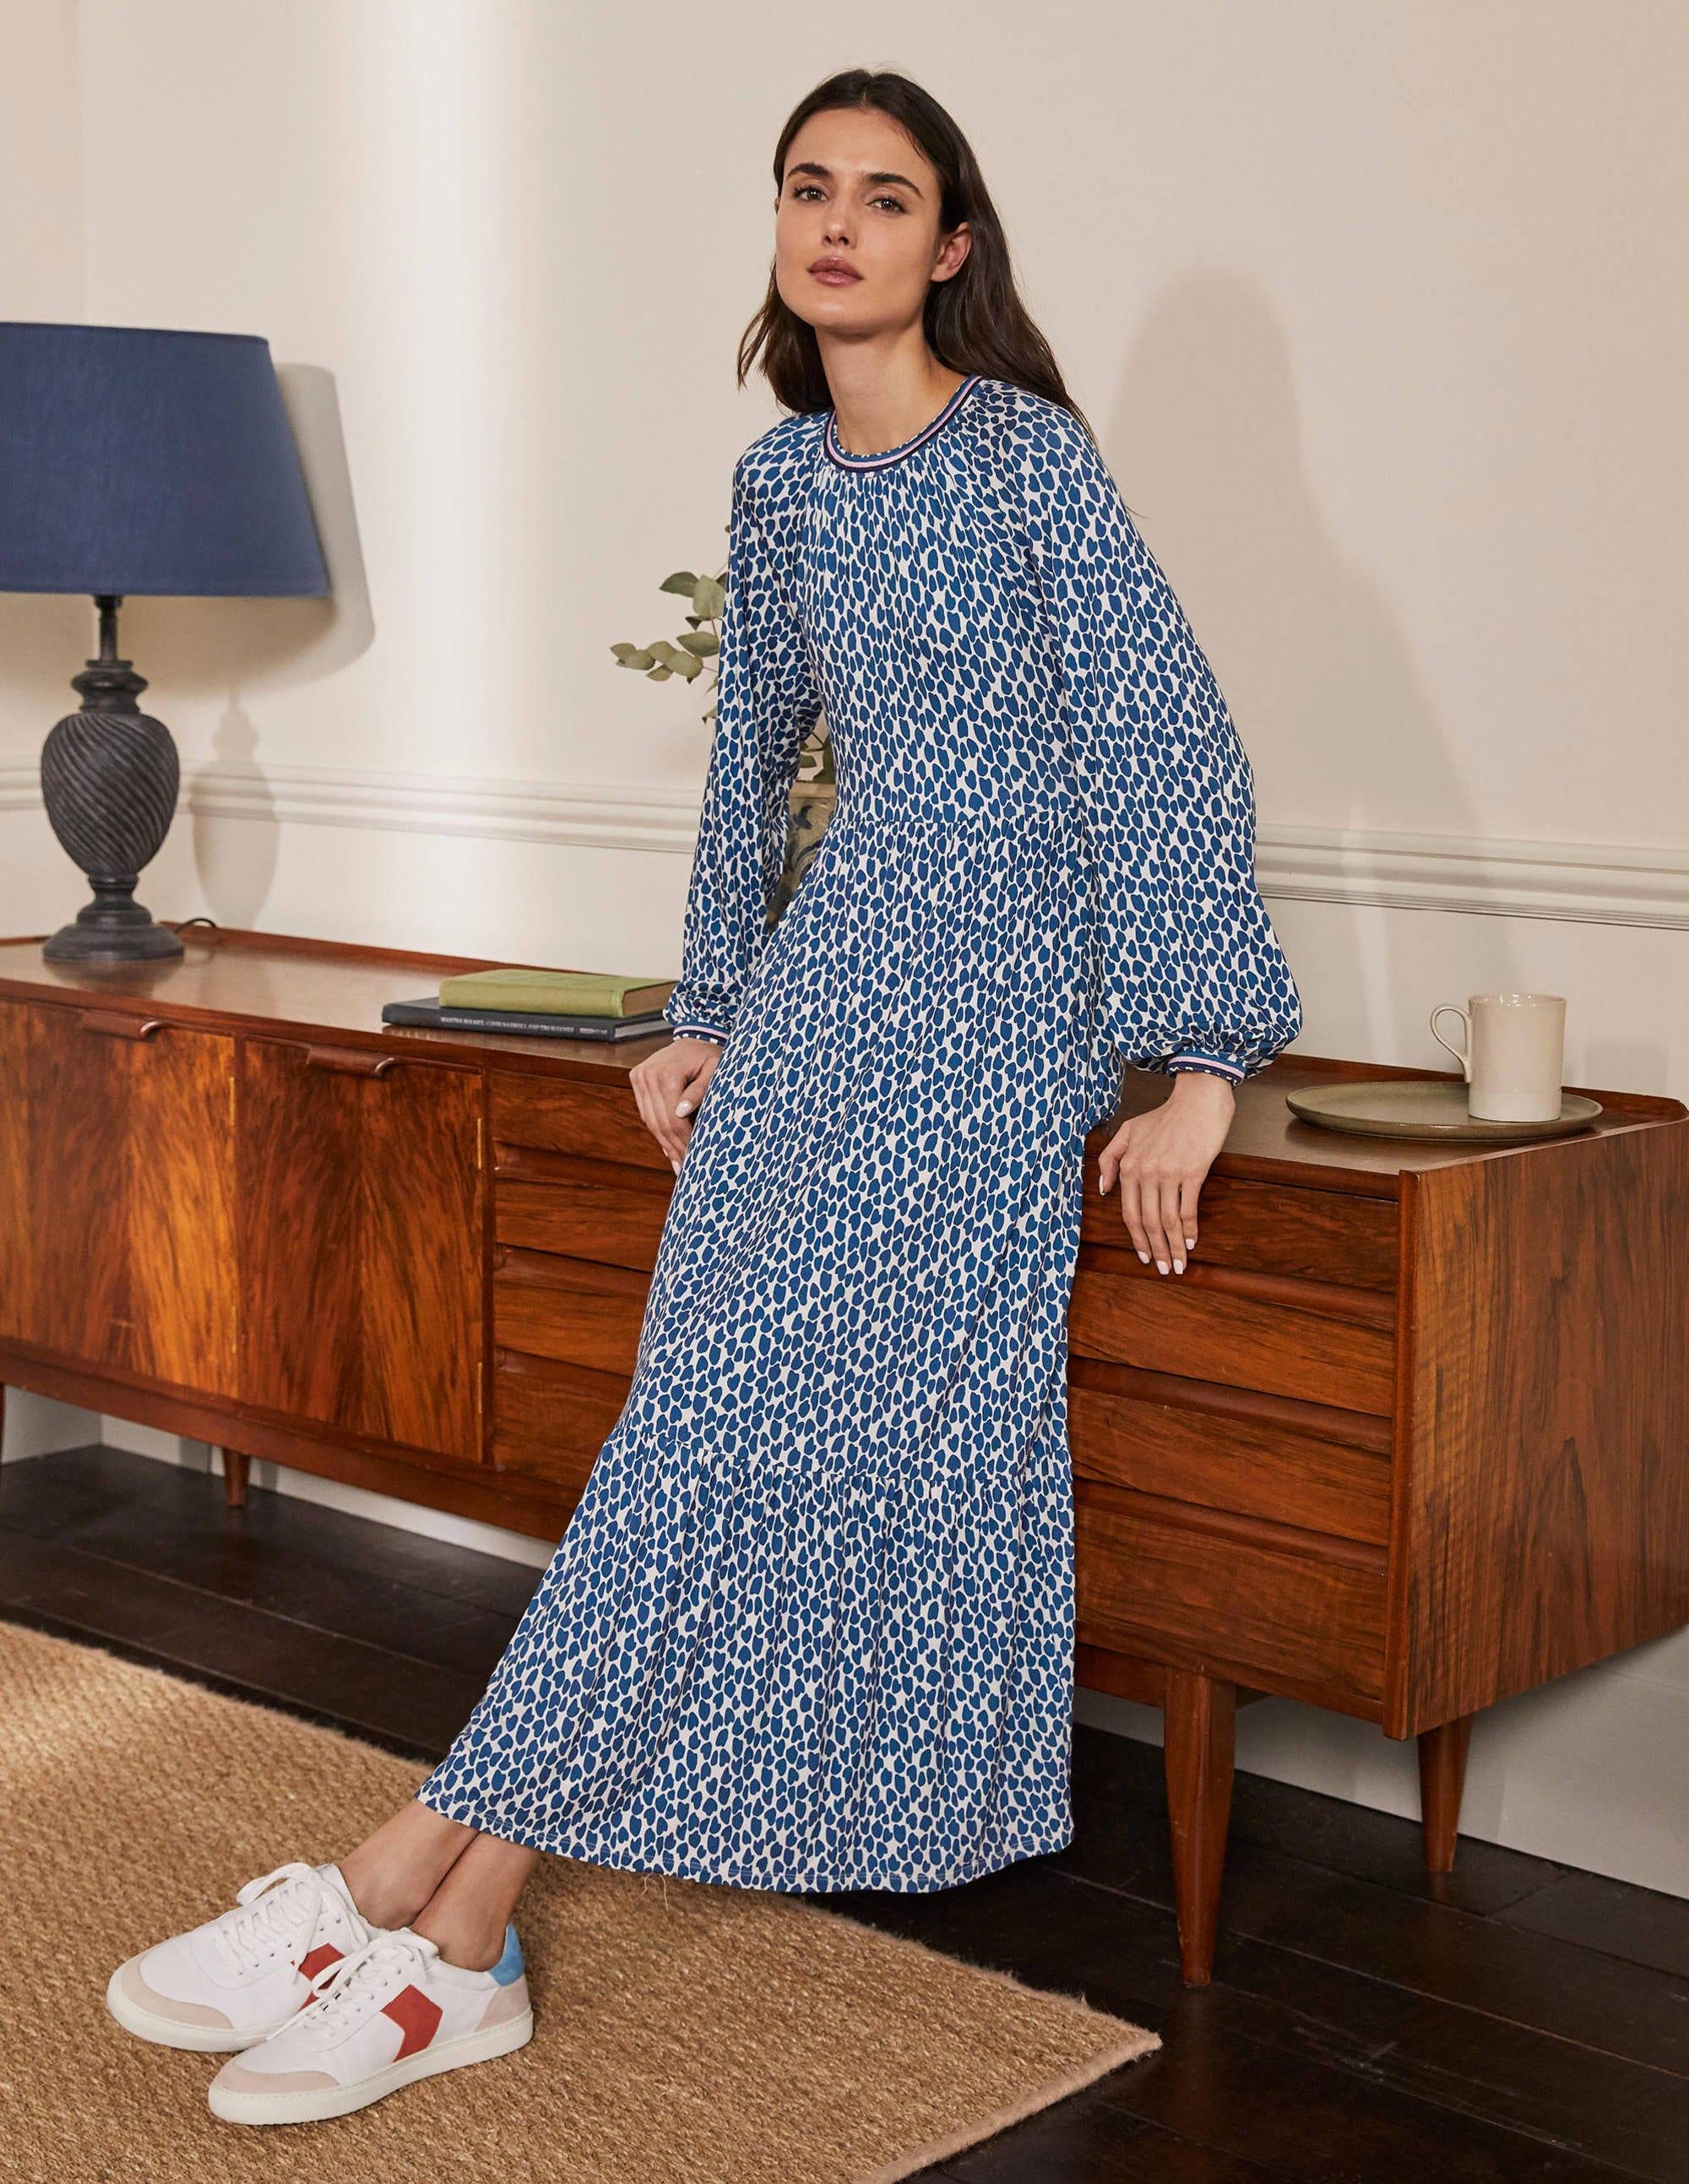 Boden Embroidered Jersey Midi Dress - Galaxy Blue, Cheetah Geo